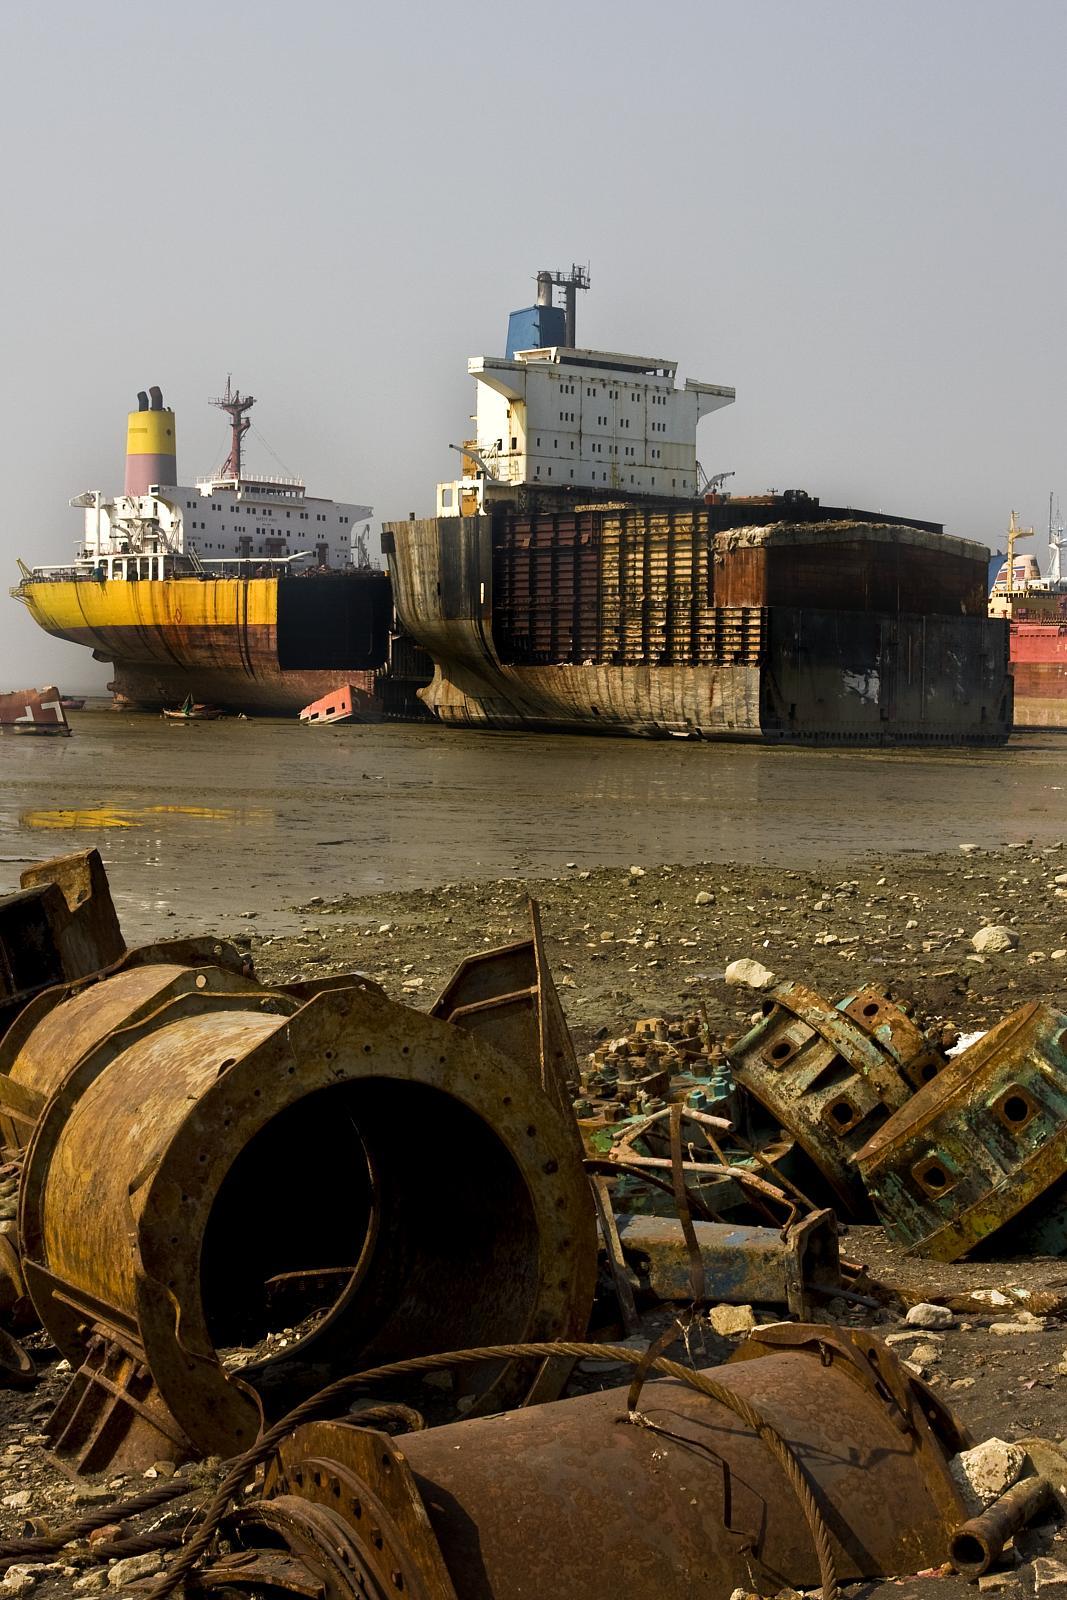 shipbuilding in bangladesh